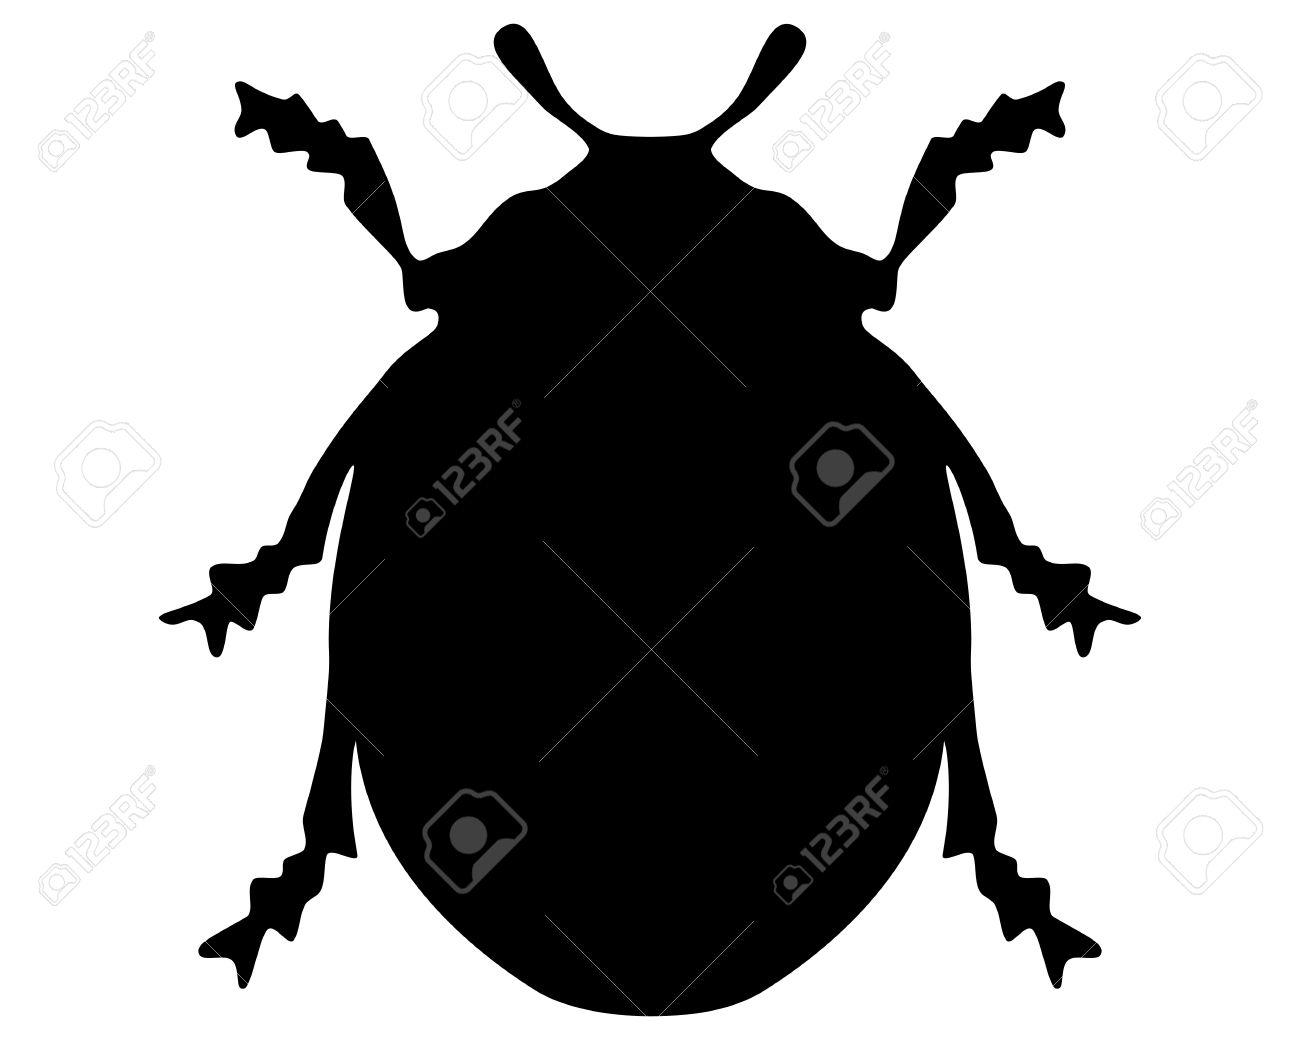 1300x1040 Ladybug Silhouette